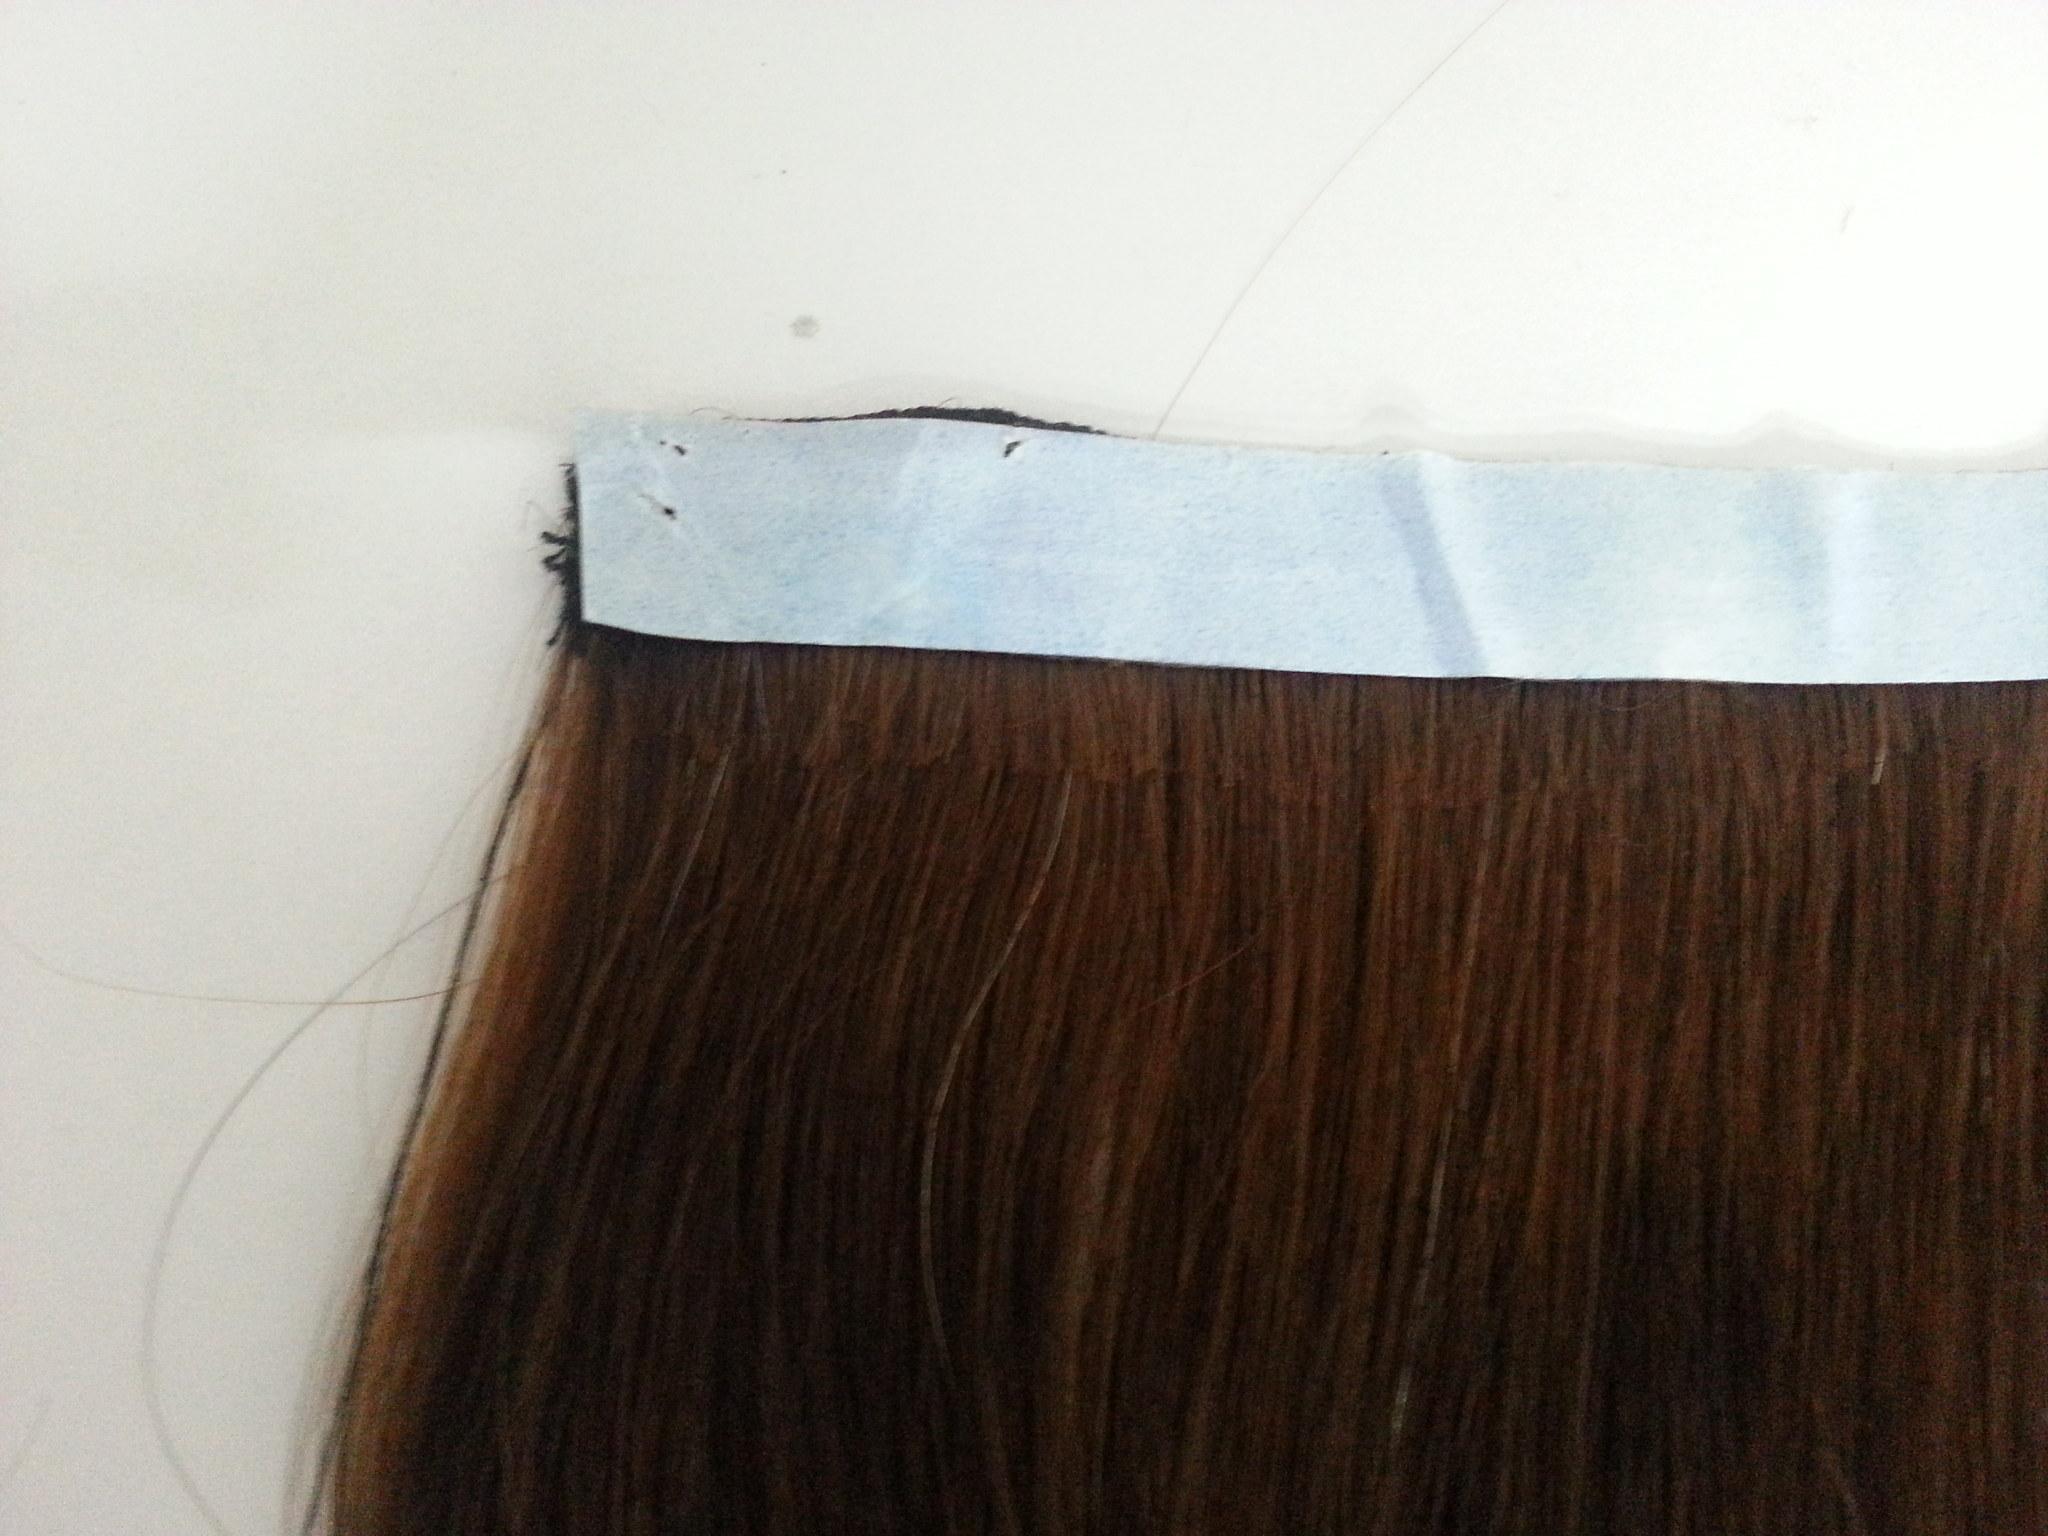 Fita adesiva azul dupla face Lace Front transparente 11m - Fina